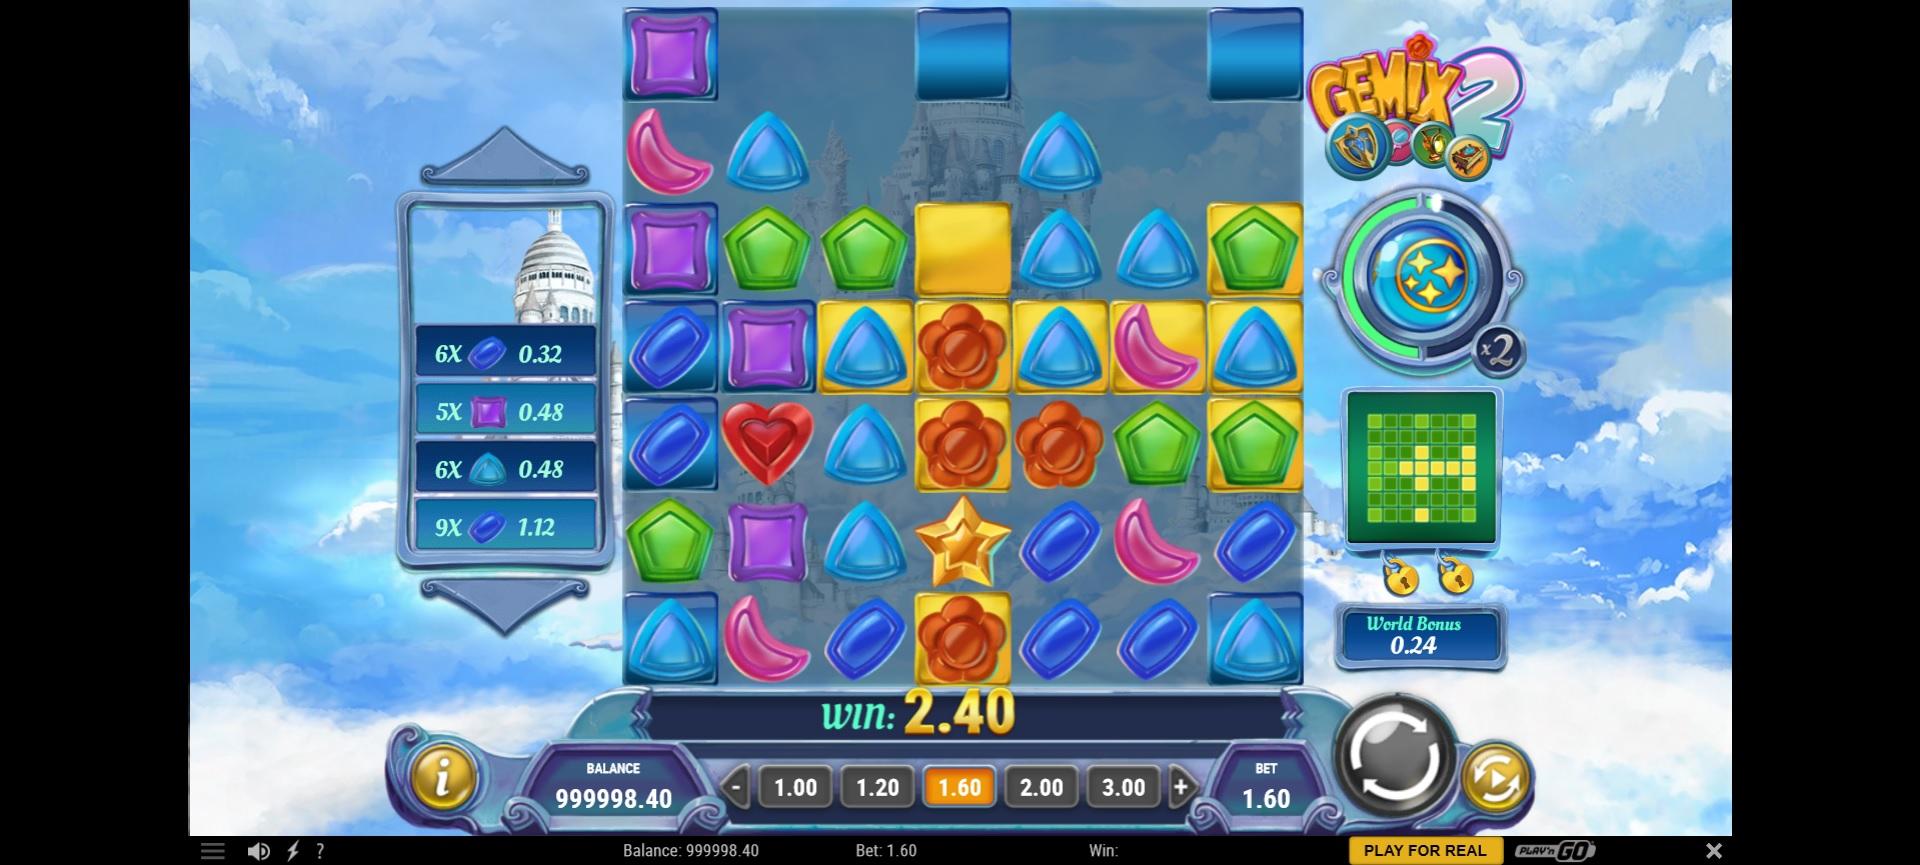 gemix 2 main game